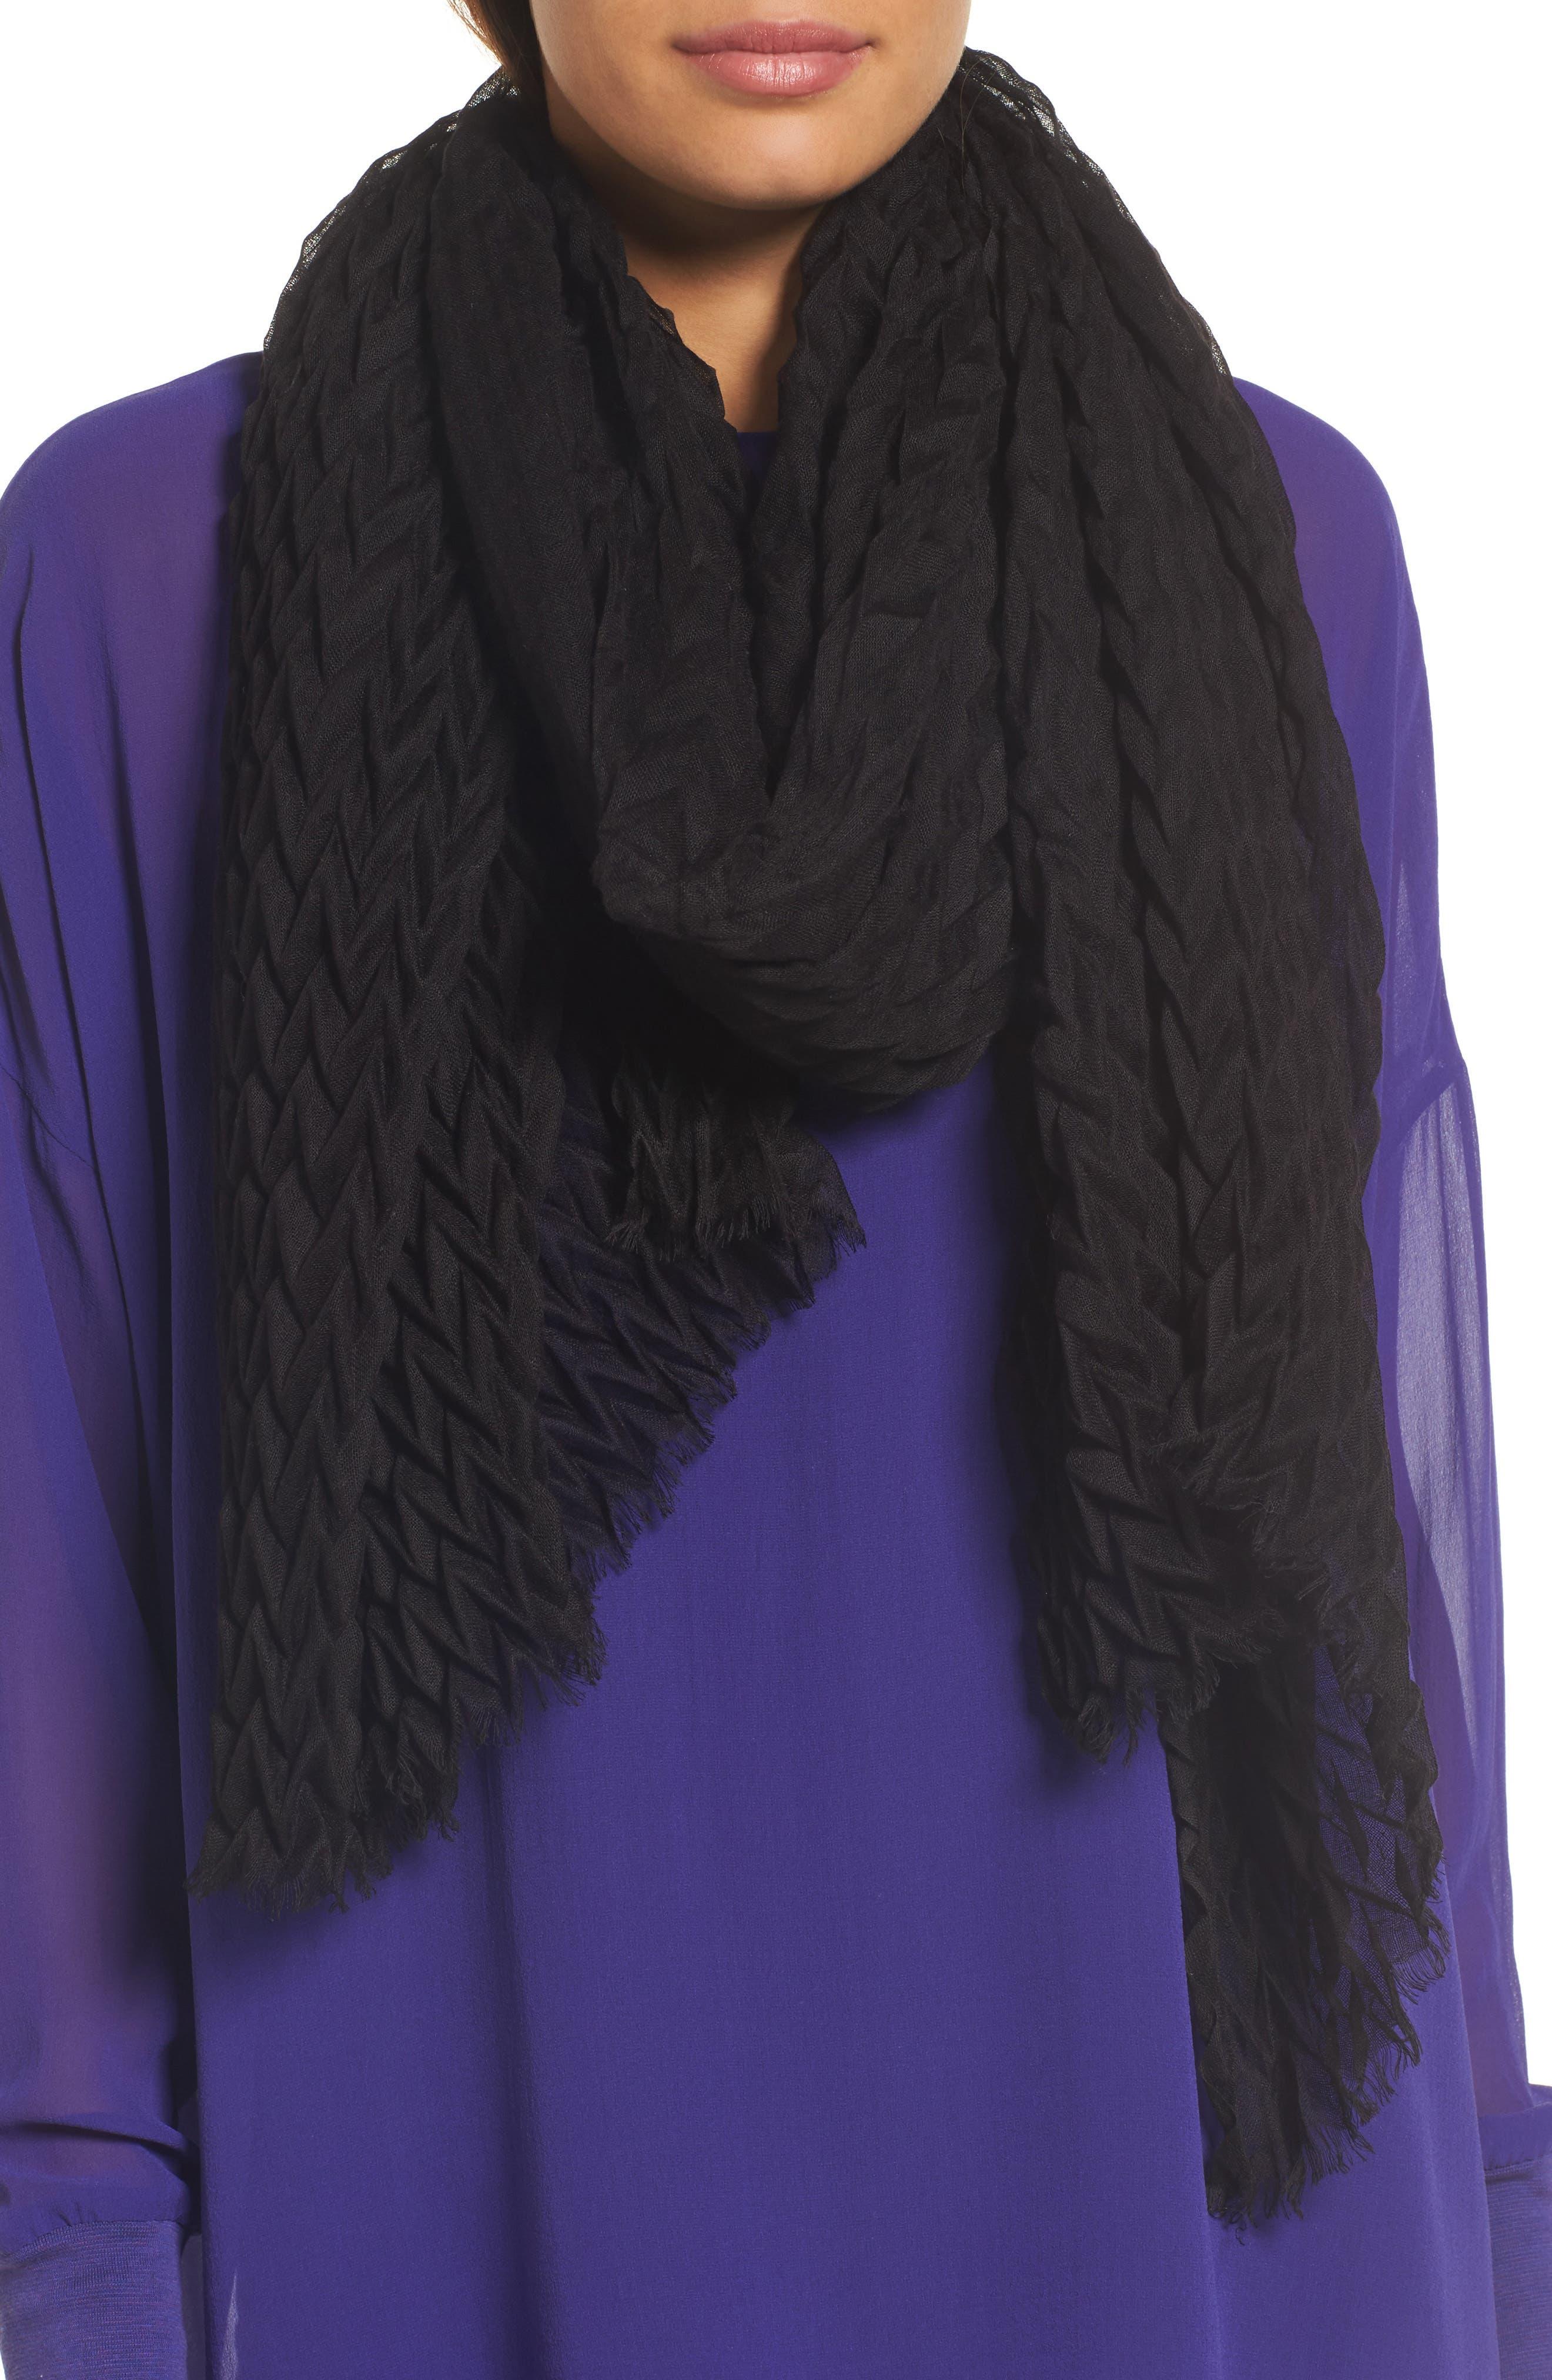 Silk & Wool Wrap,                             Main thumbnail 1, color,                             Black